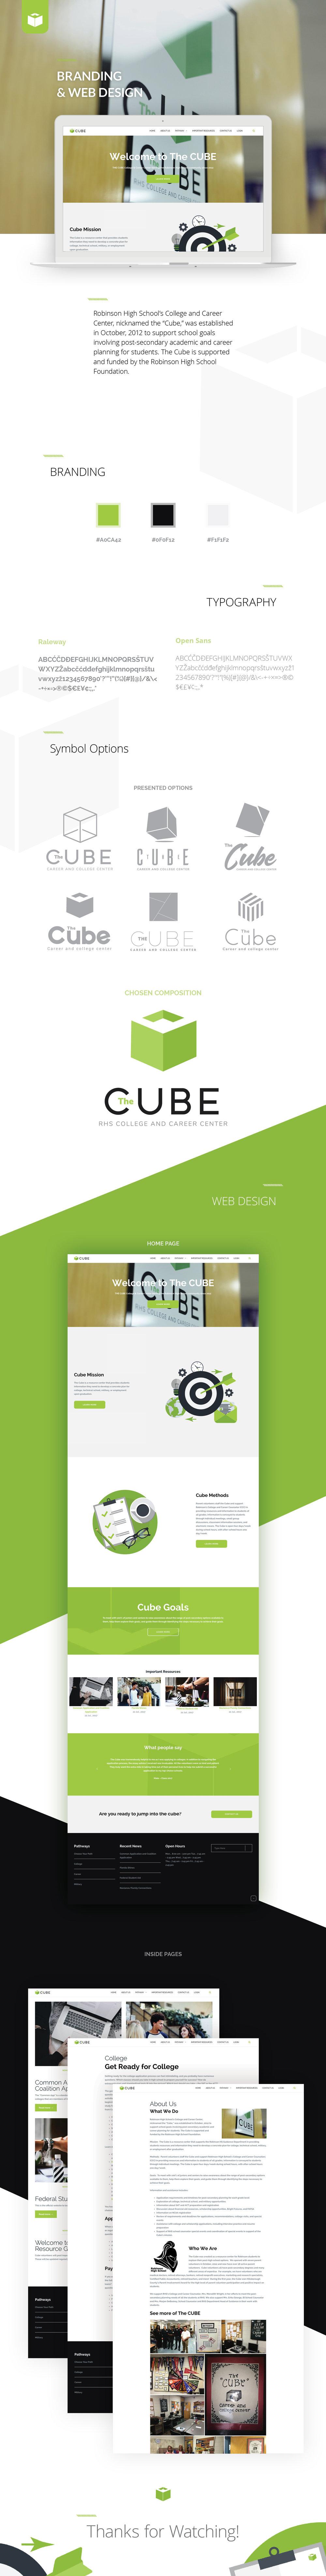 cube_Presentation_2.jpg